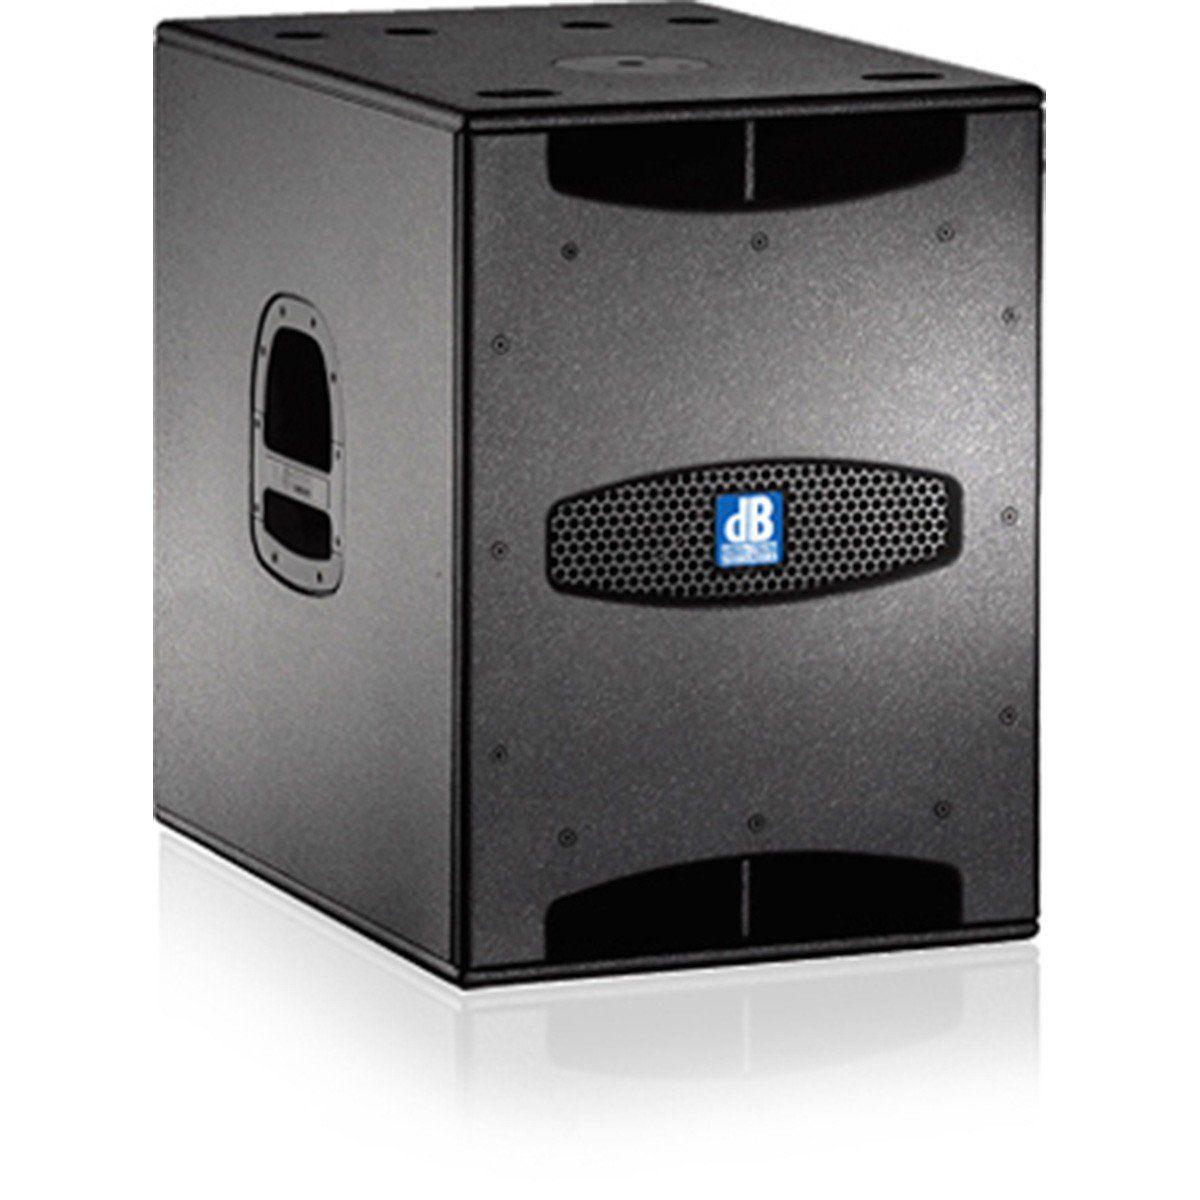 dB Technologies Sub 15D Caixa de Som Sub-15-D Subwoofer Ativo 800W para Flexsys